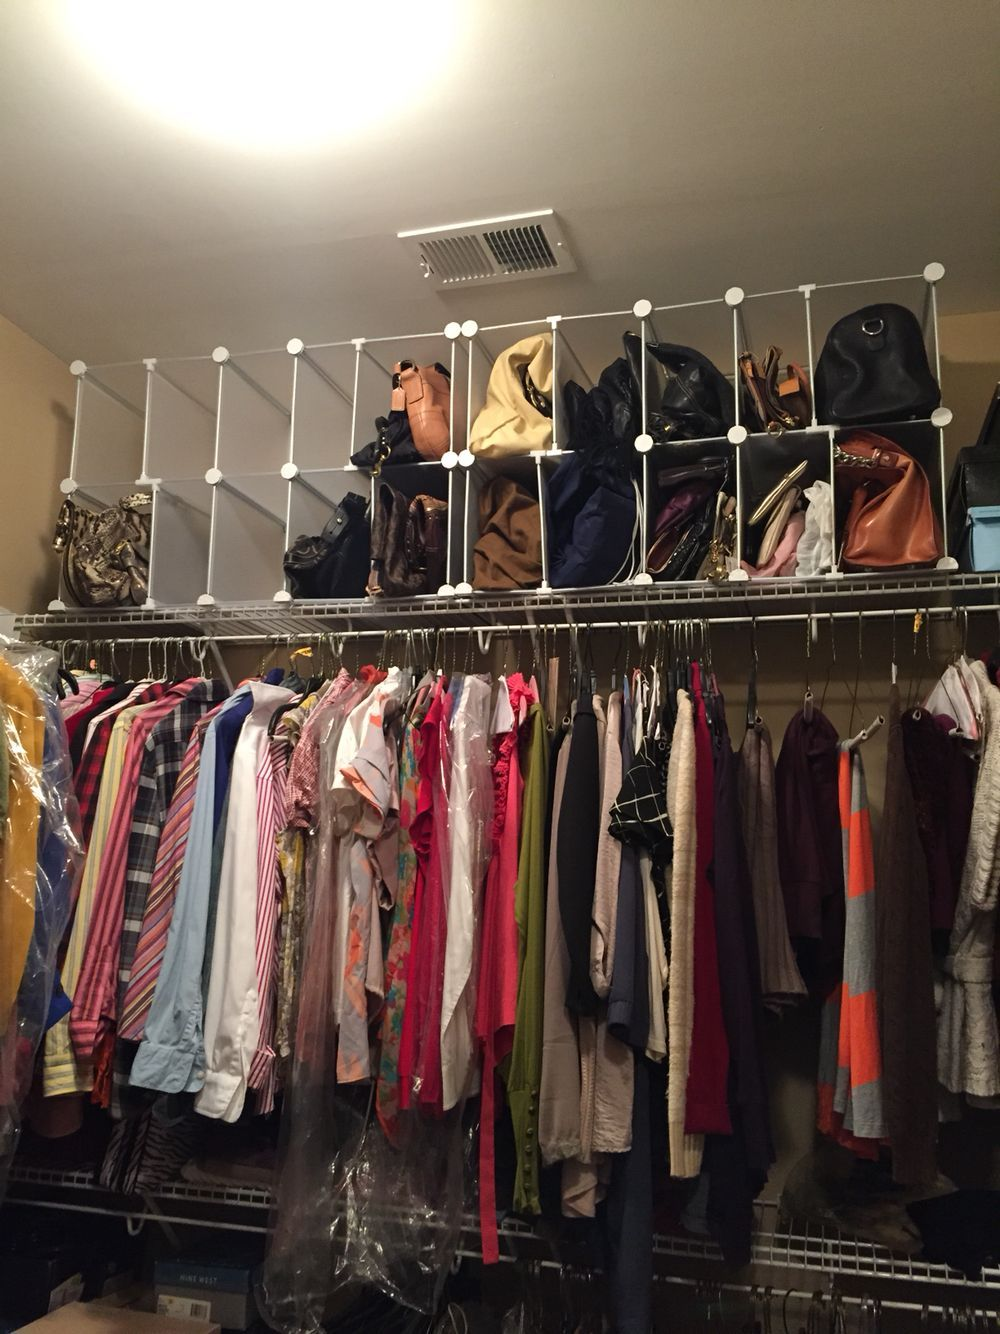 Closet Purse Organizer Closet Organizer Purse